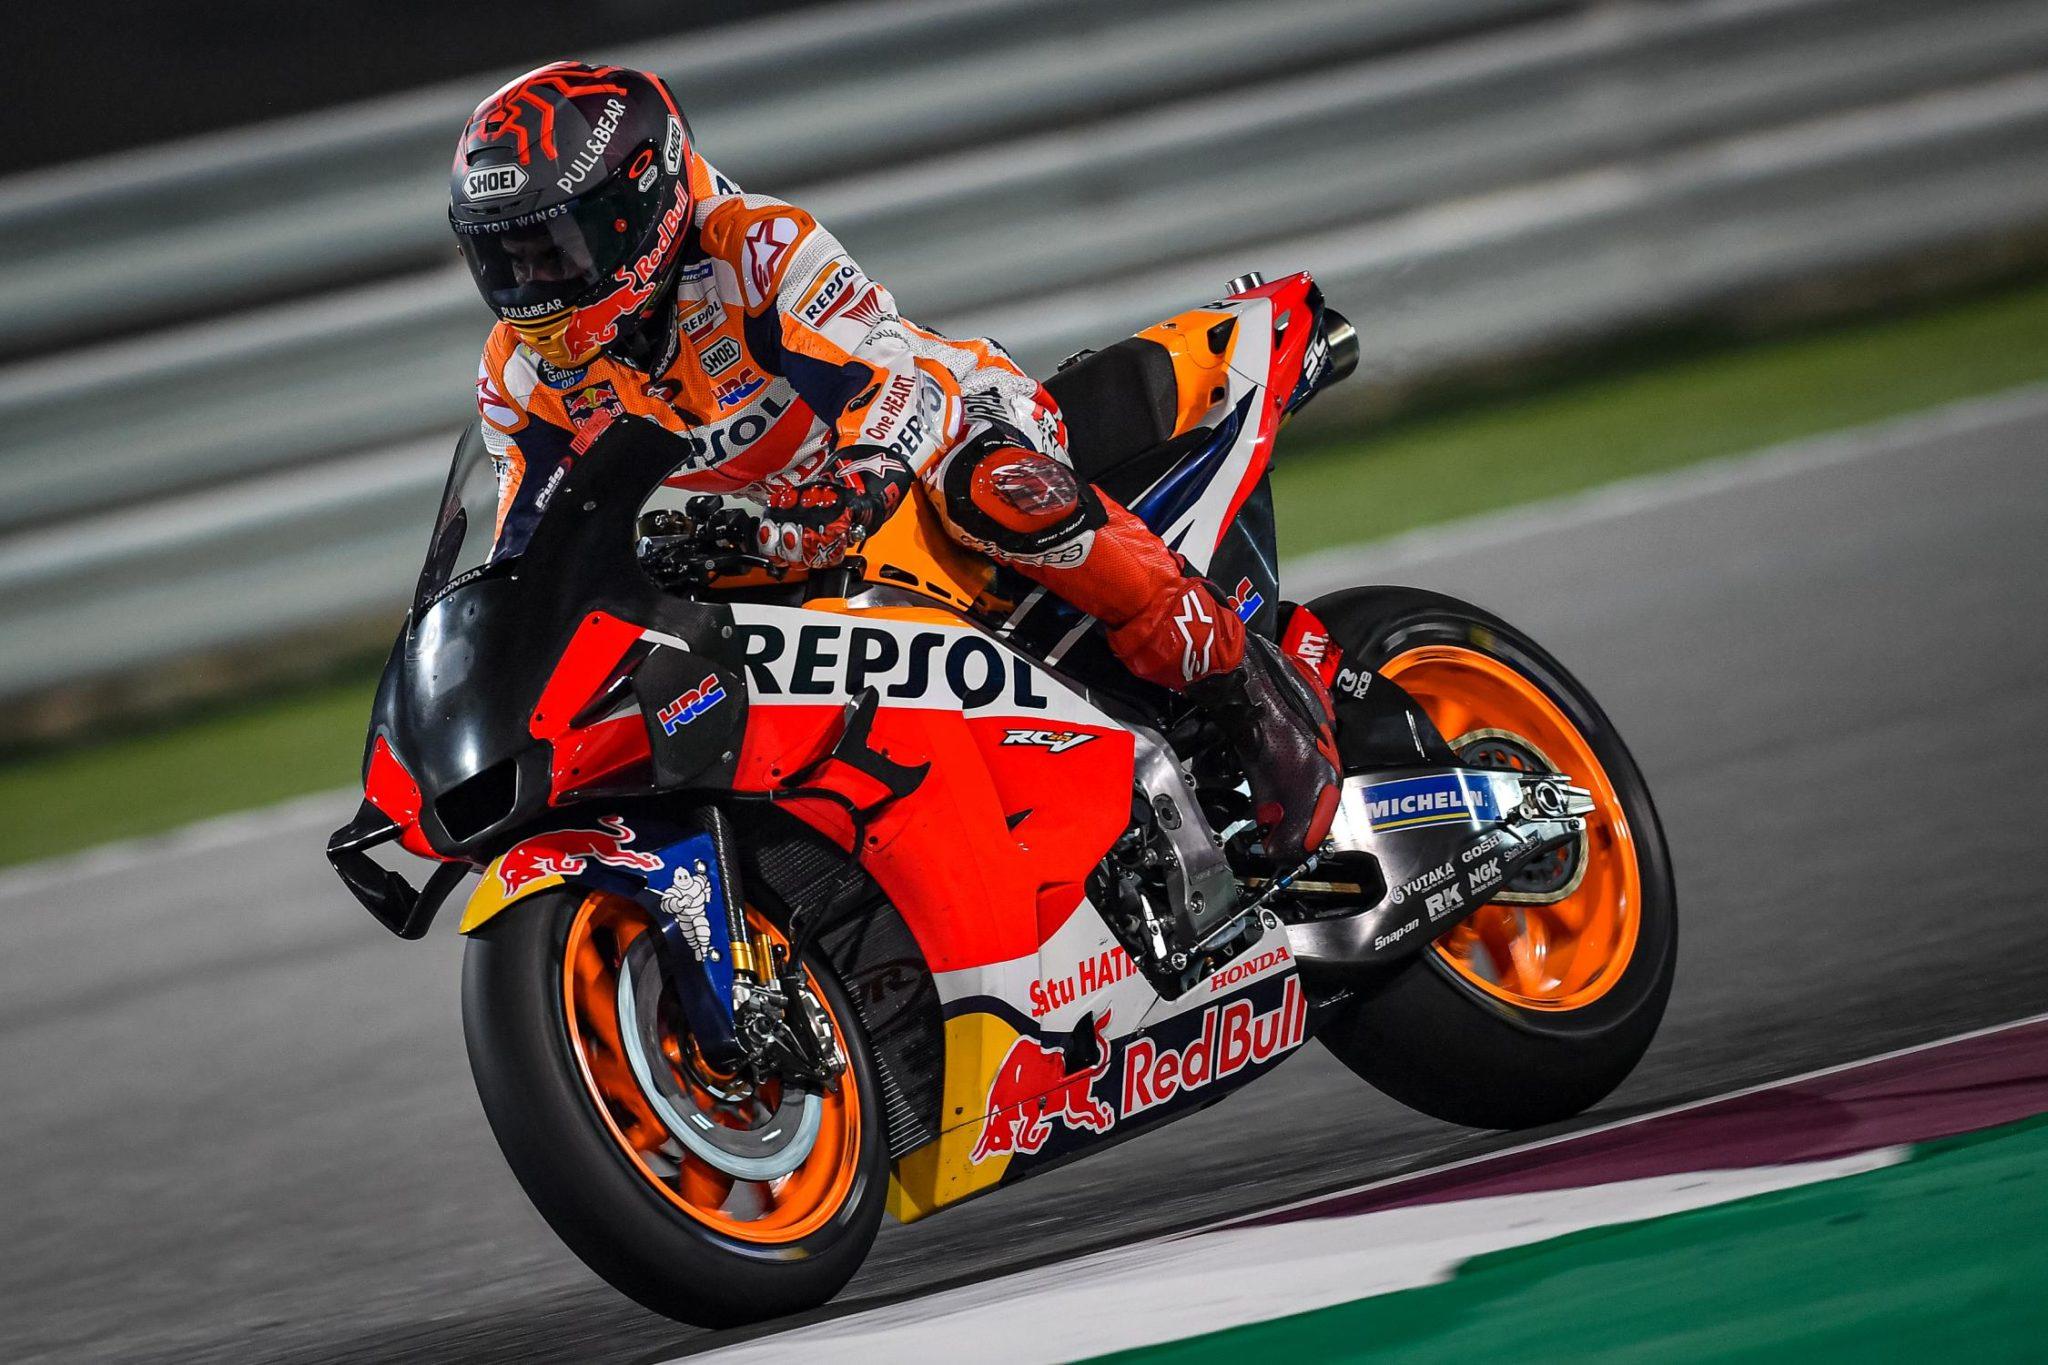 2020 Motogp Top Speed Yamaha S As Fast As Honda At The Qatar Tests Drivemag Riders